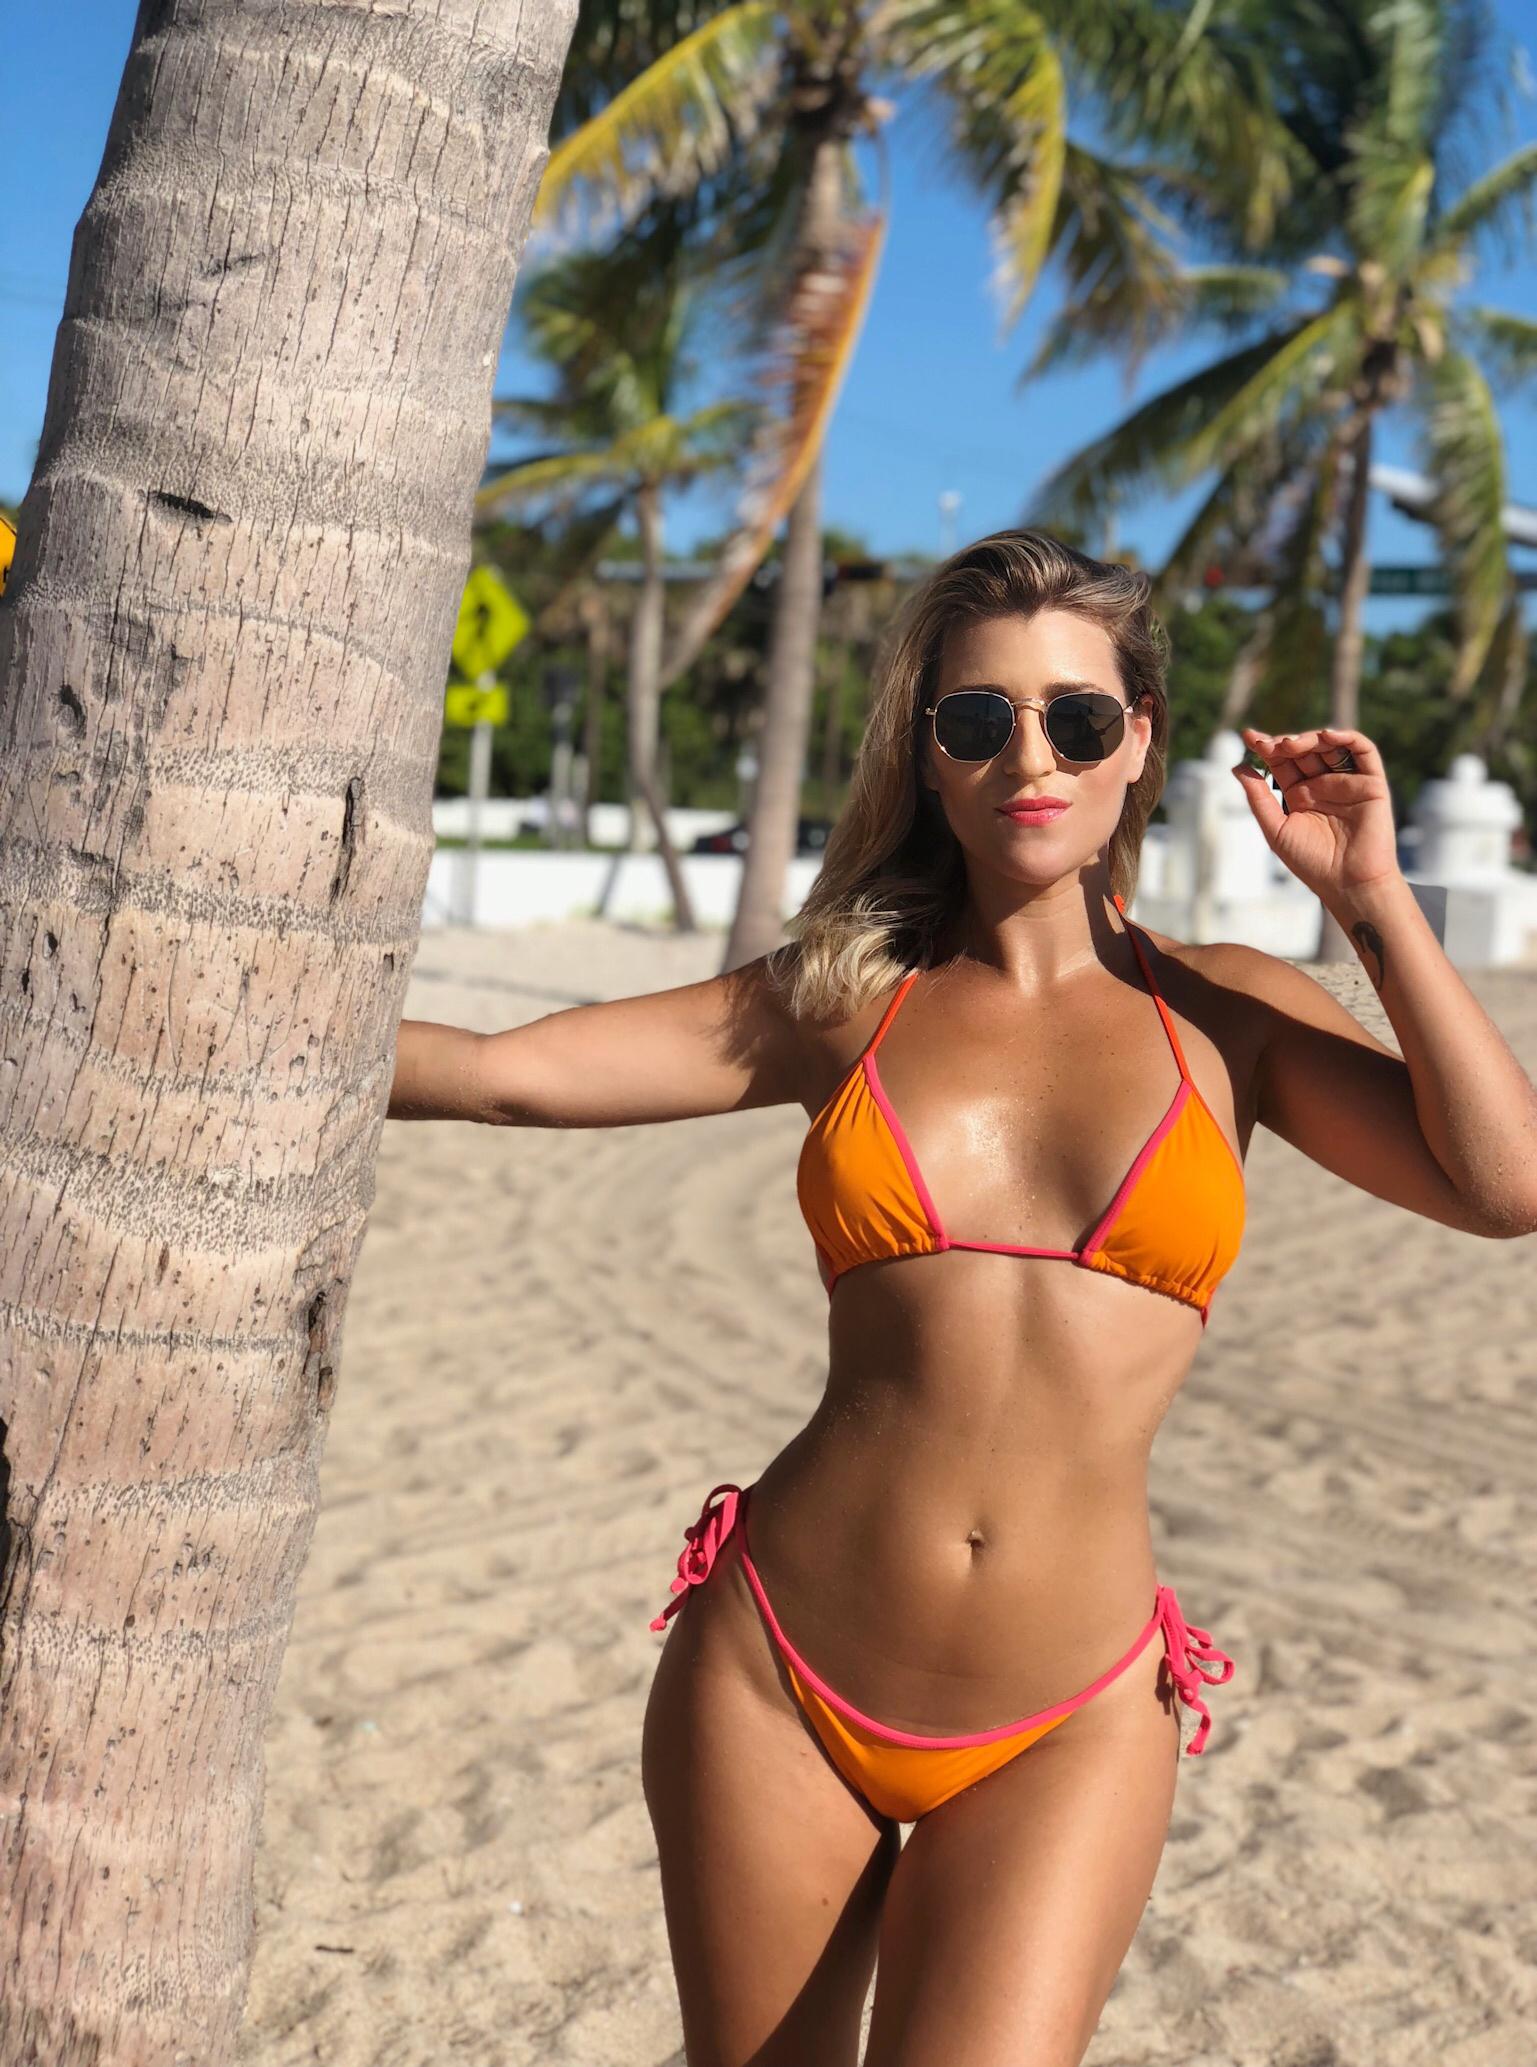 string bikini, string bikini top, string bikini bottom